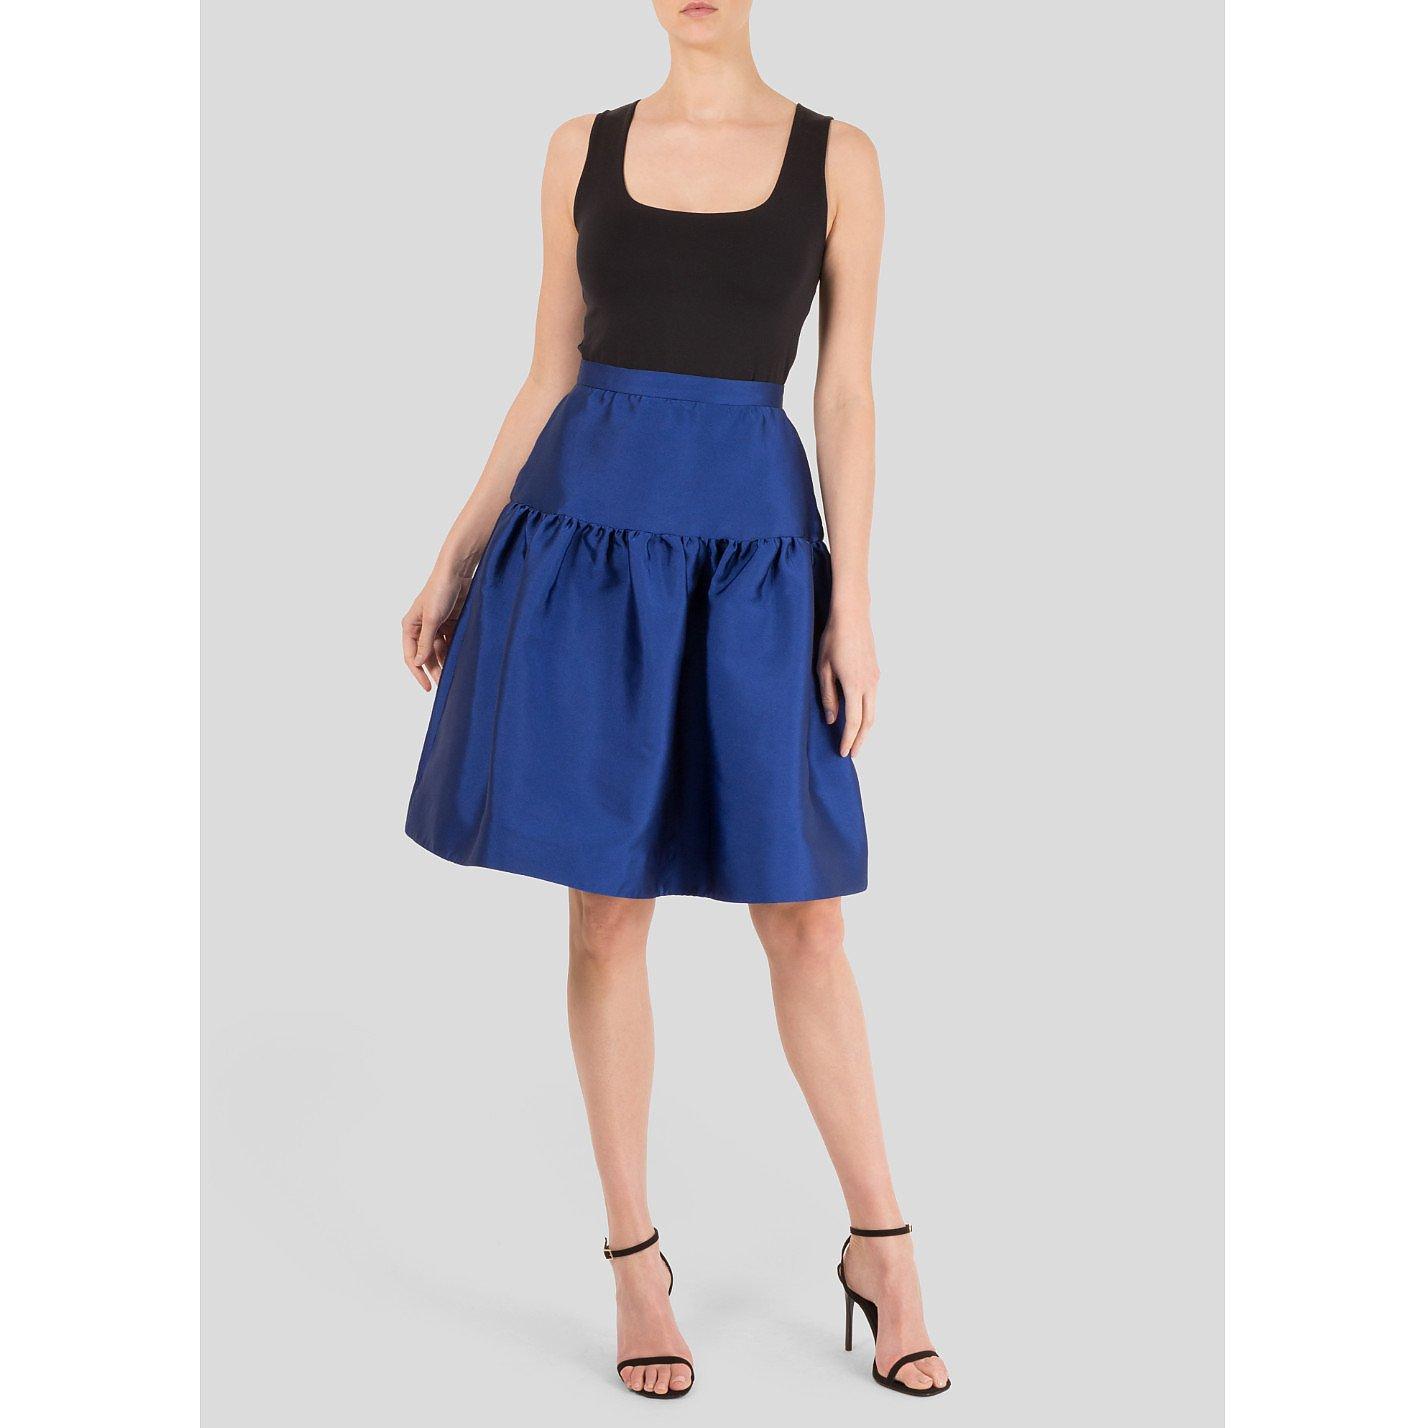 Temperley London Flared A-Line Skirt